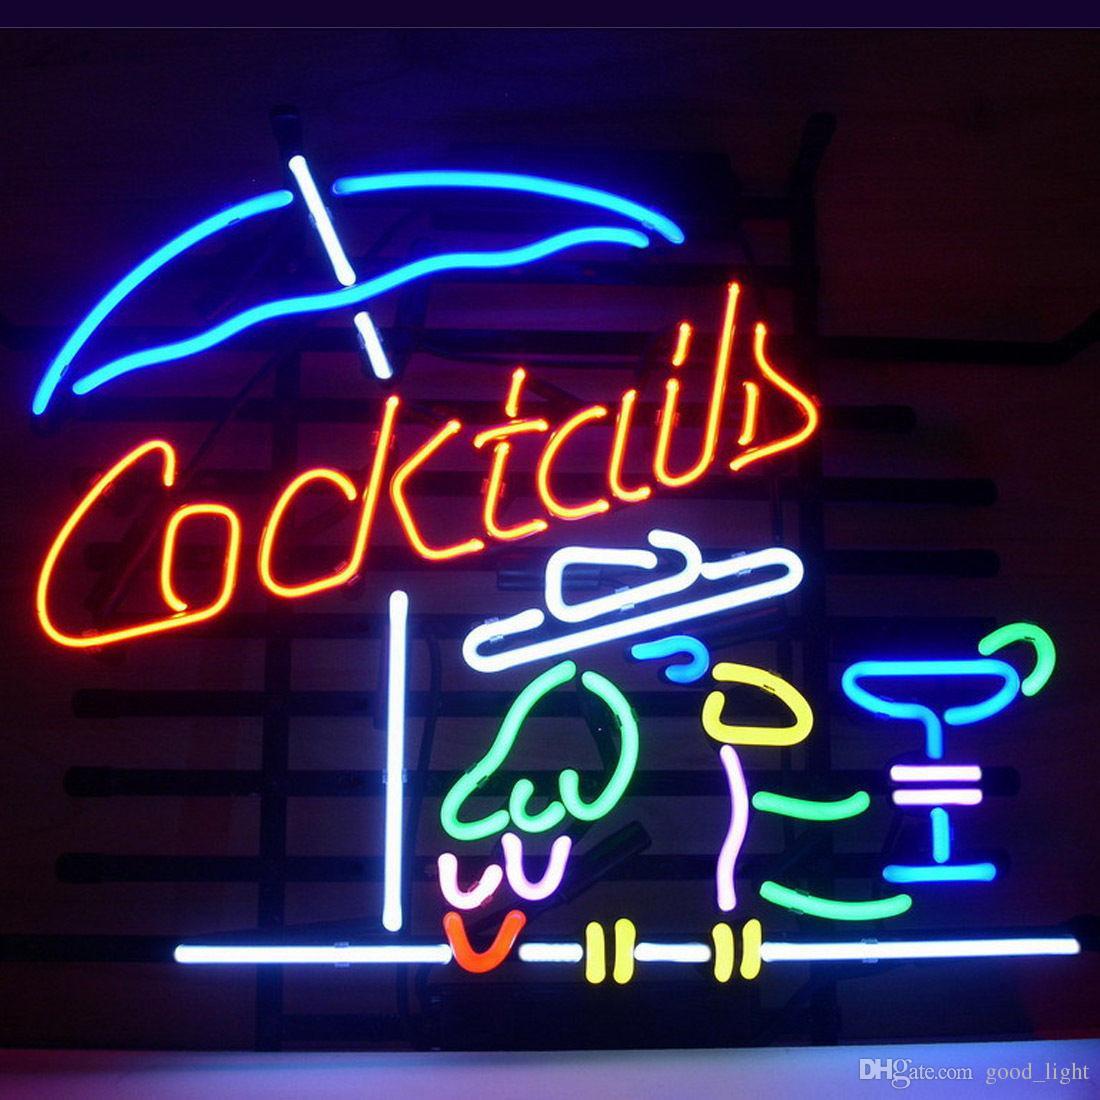 "COCKTAIL PARROT COCKTAILS Neon Light Sign Beer Bar Pub Club Shop Display 17""x14"""